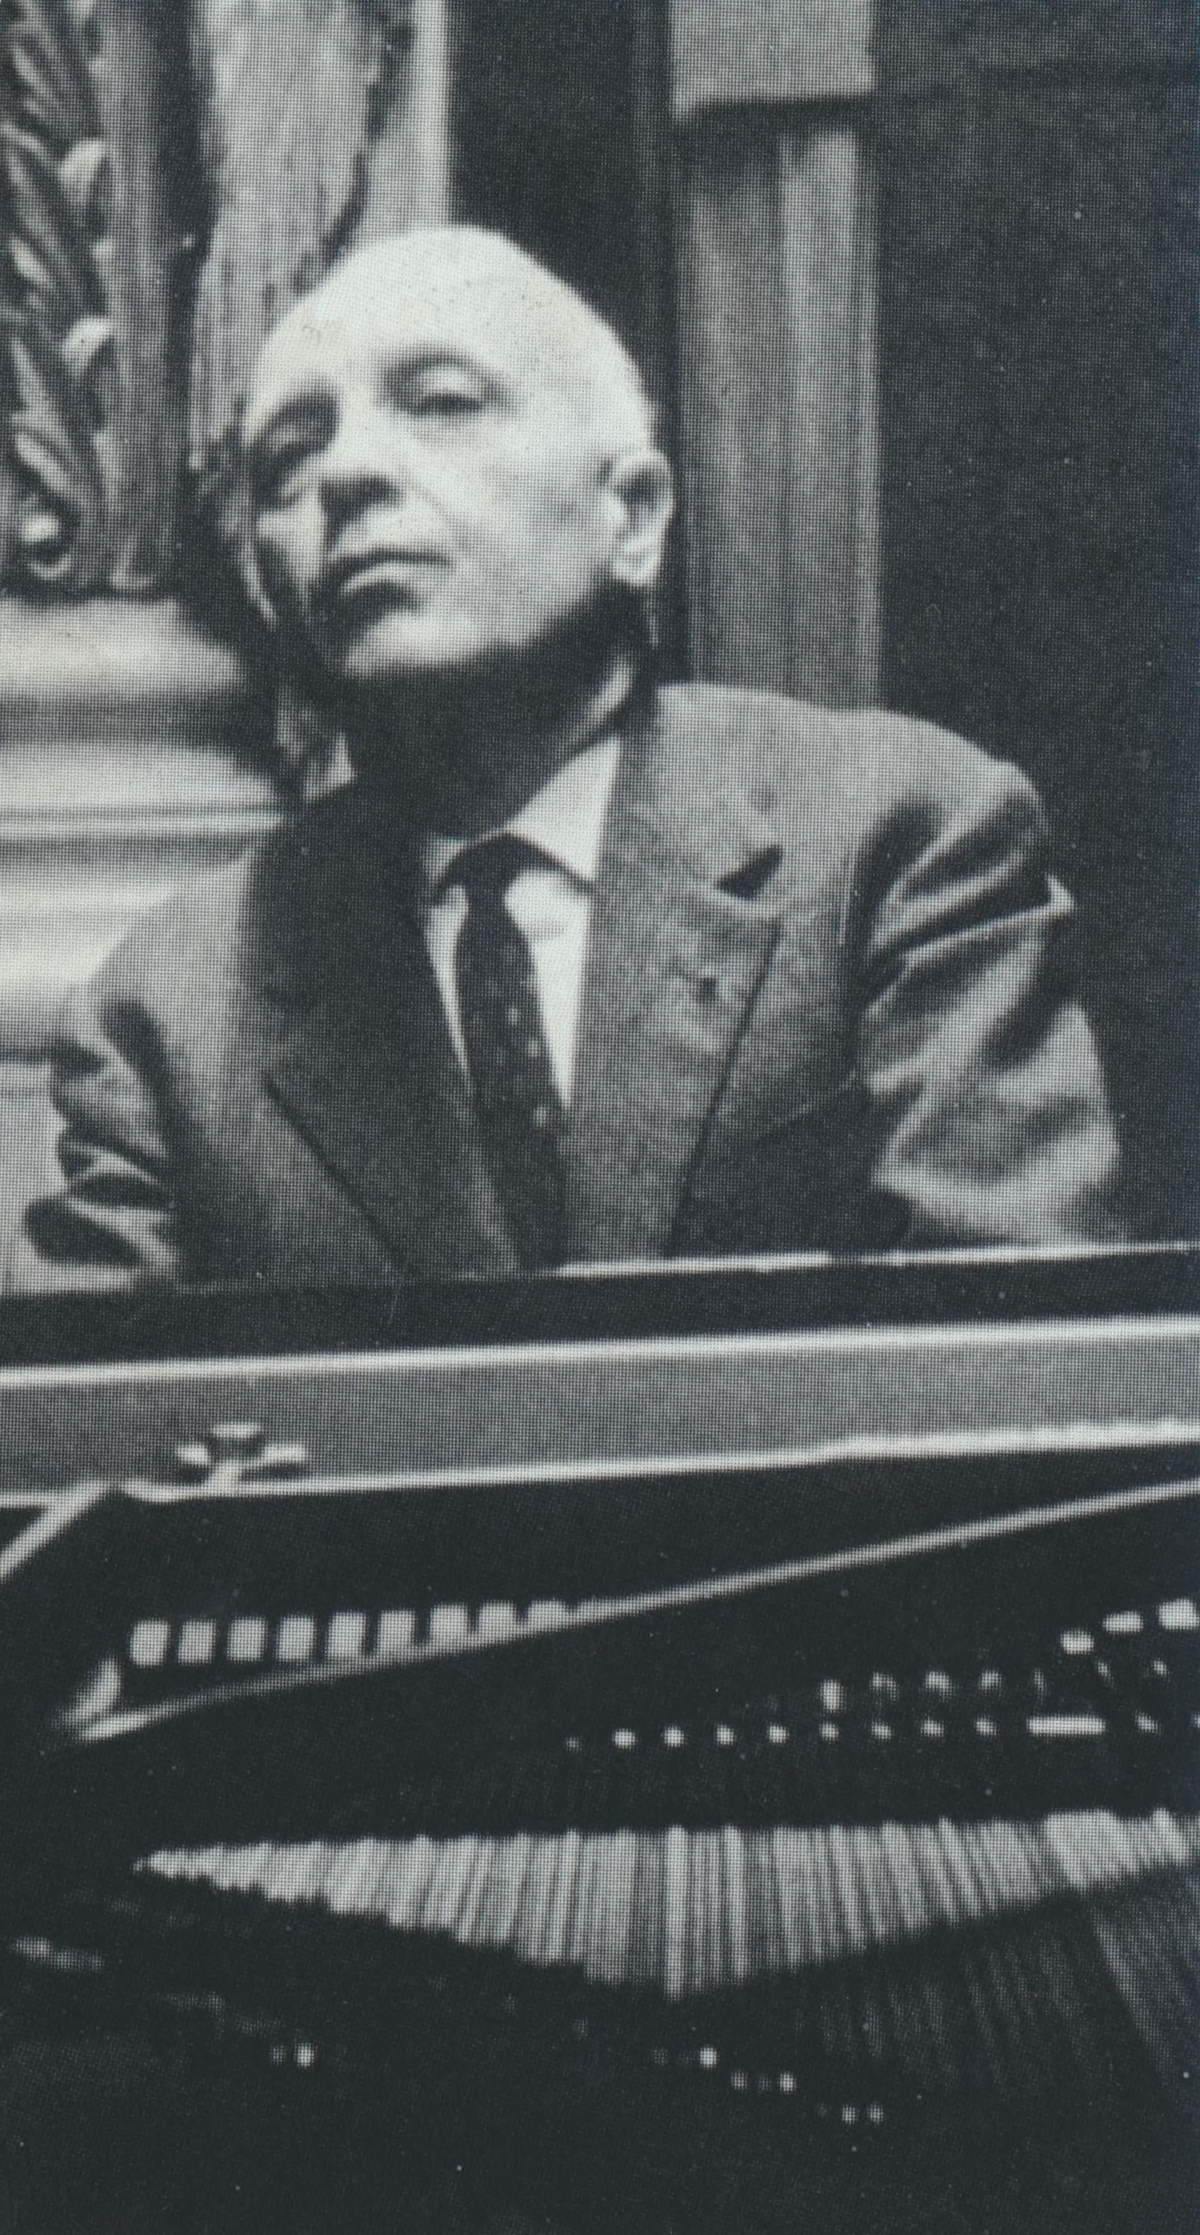 Robert CASADESUS, photo de presse Sony, date, lieu et photographe inconnus